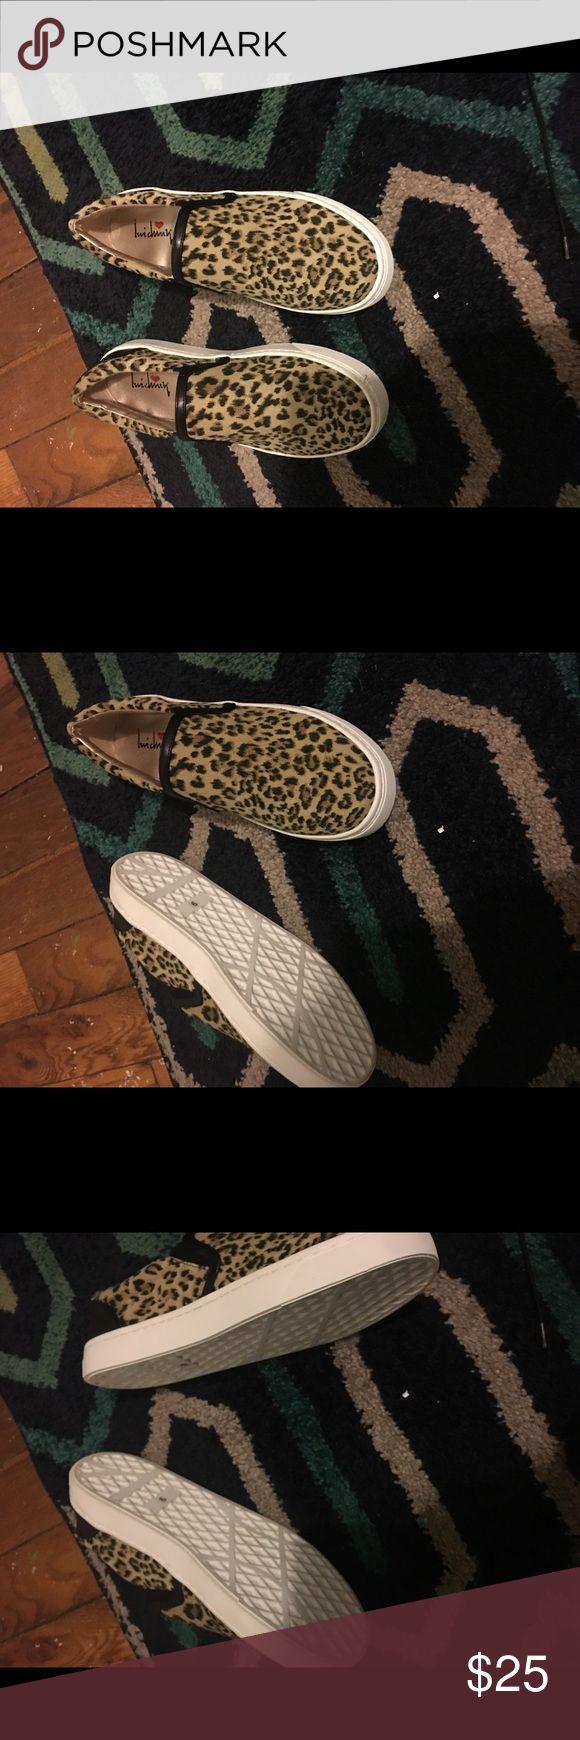 Leopard slip ons Leopard slip on sneakers Shoes Sneakers